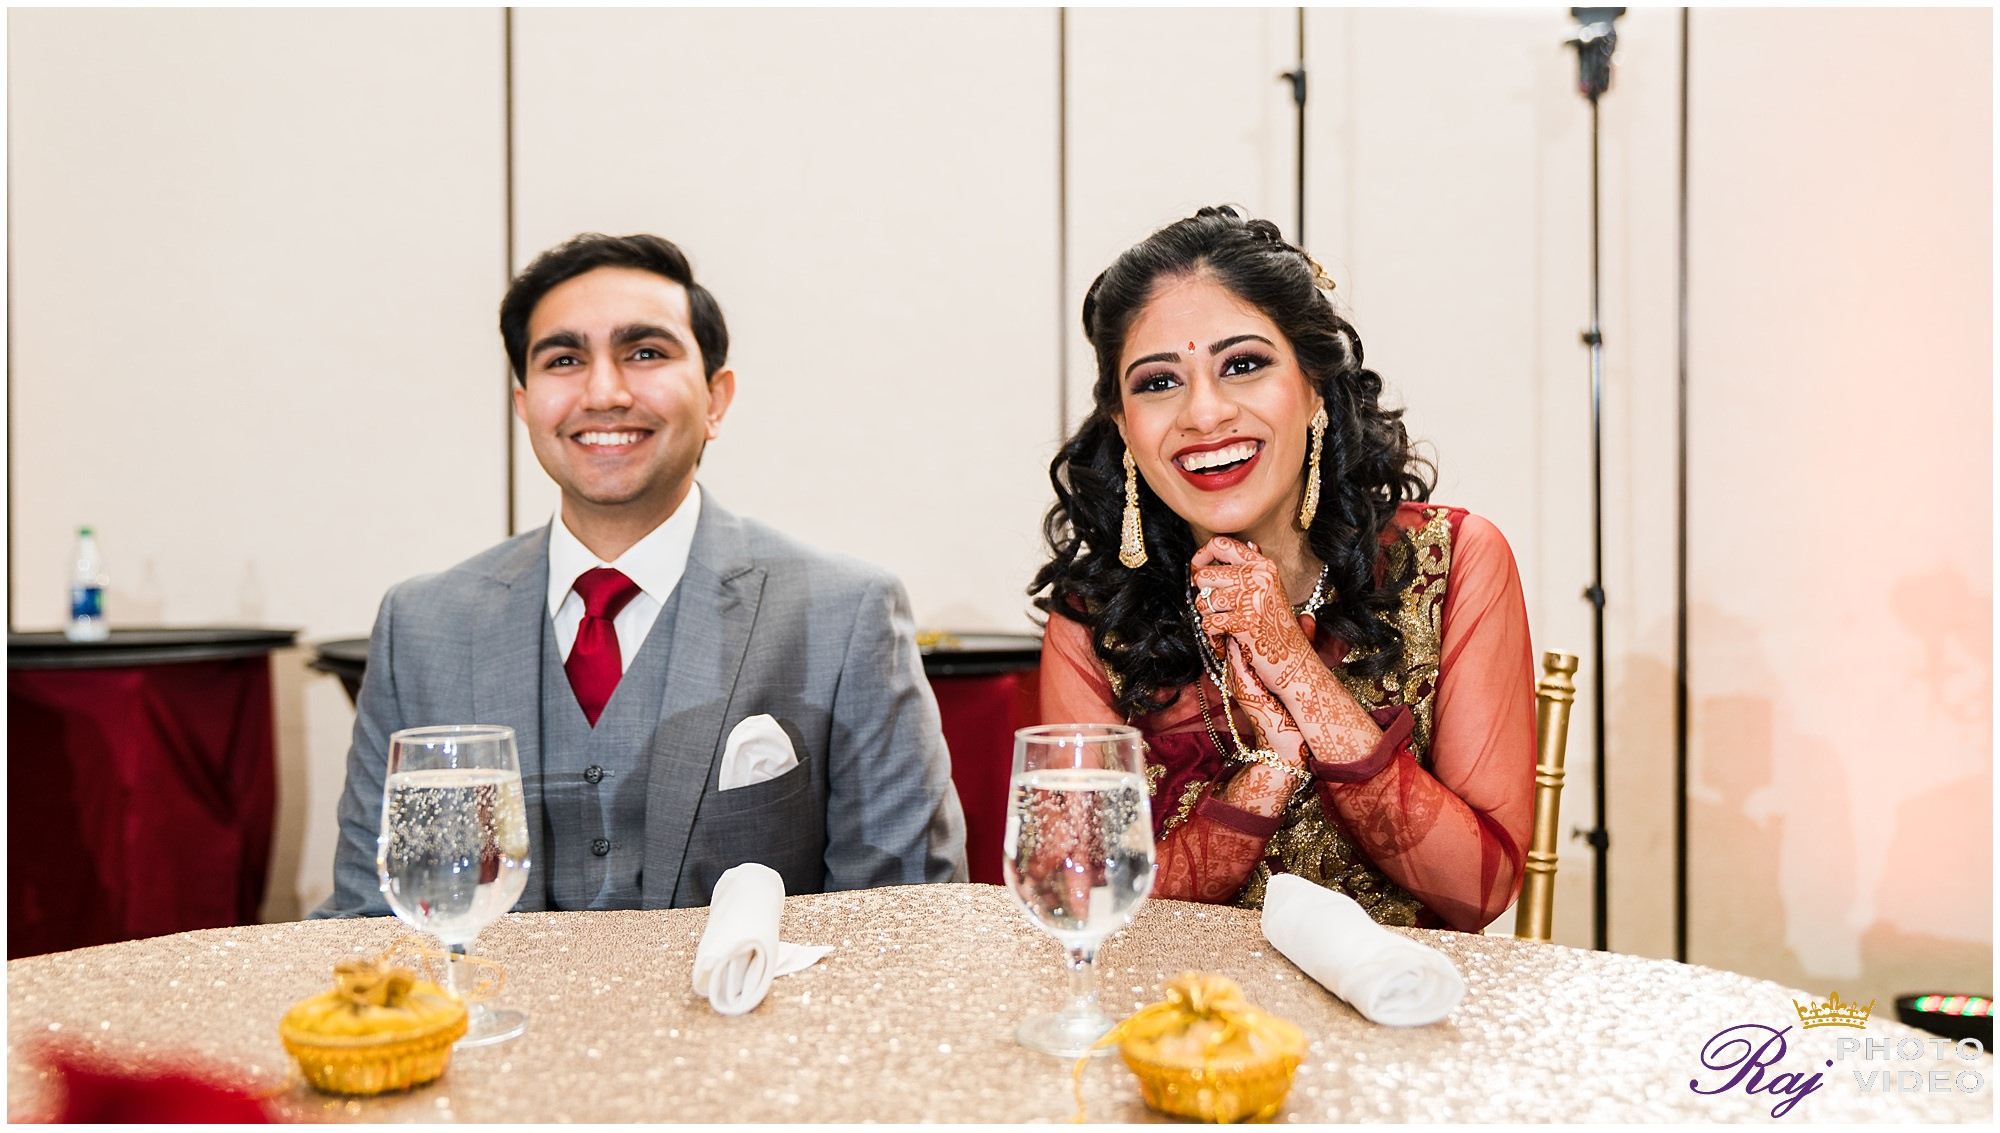 Founders-Inn-and-Spa-Virginia-Beach-VA-Indian-Wedding-Harini-Vivek-82.jpg